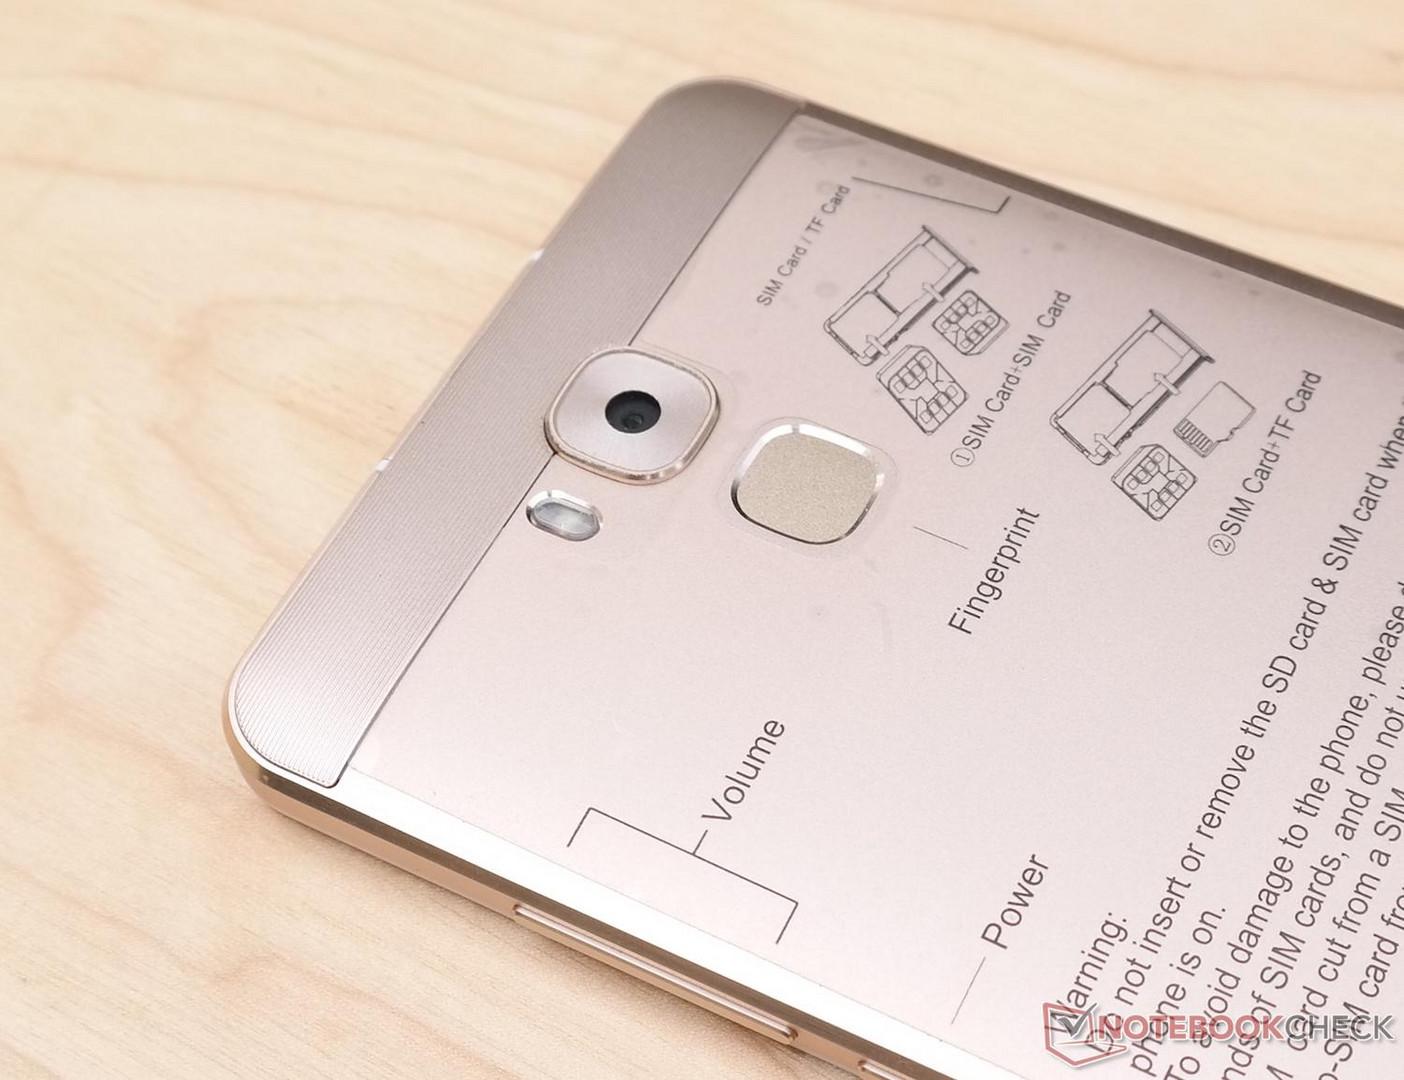 Oukitel U16 Max Smartphone Review - NotebookCheck net Reviews